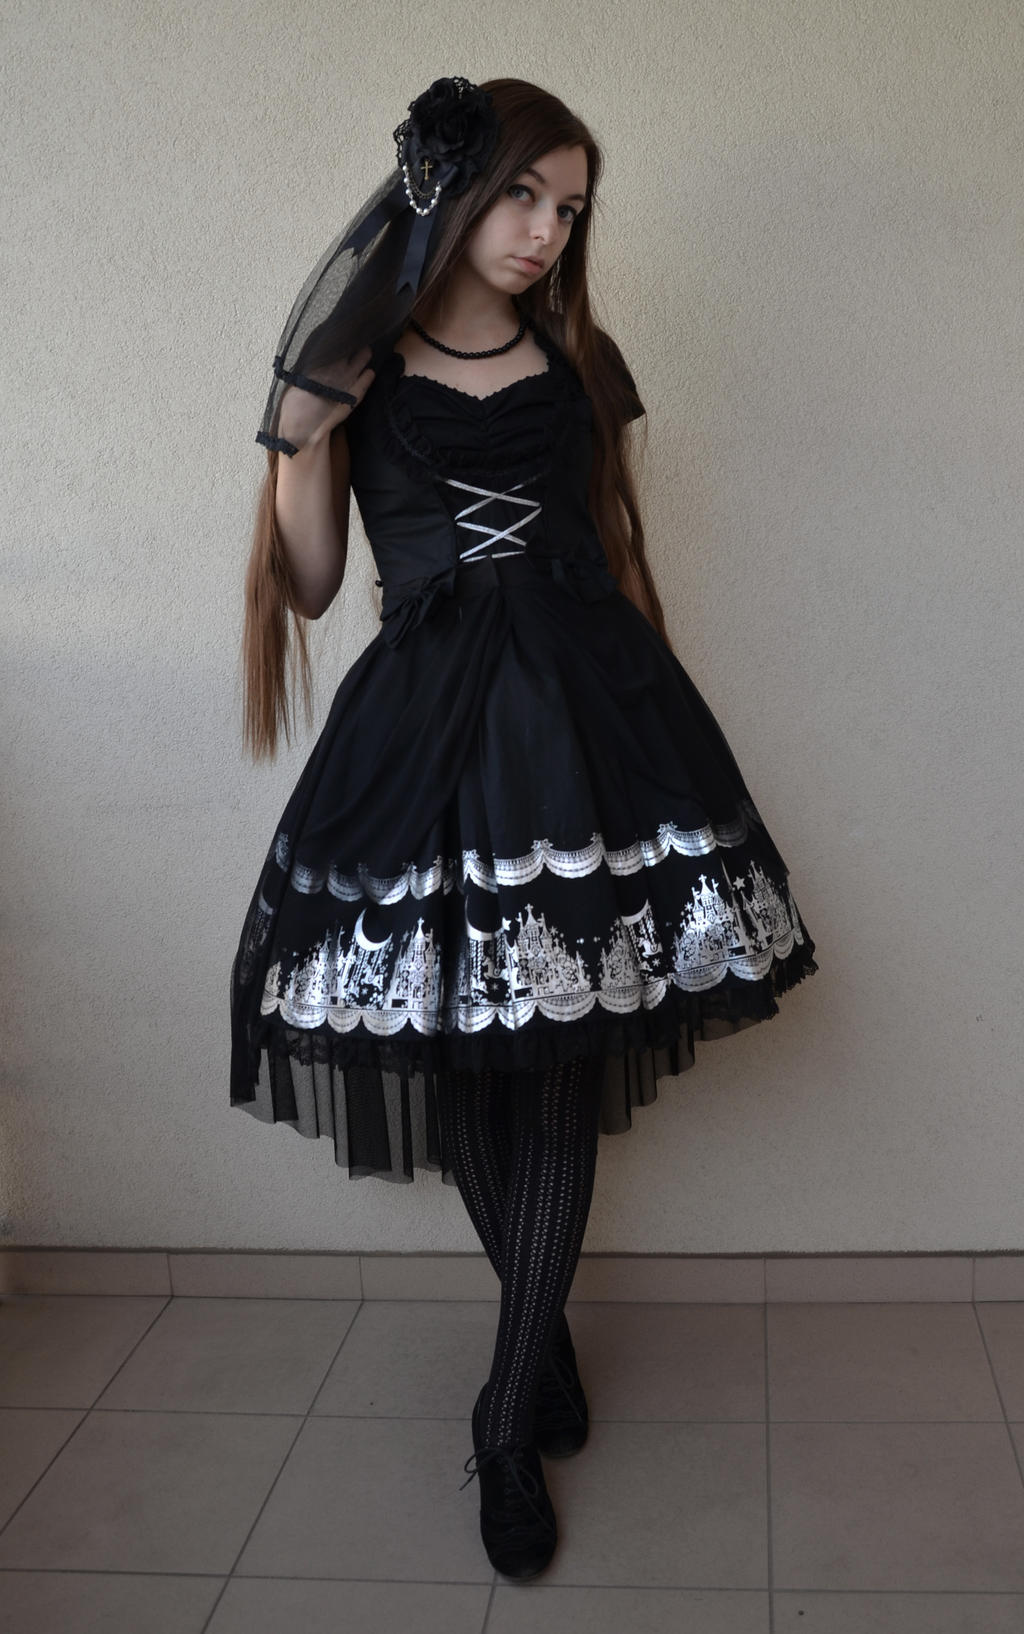 Gothic Lolita castles and chiffon 2 by sarielowa